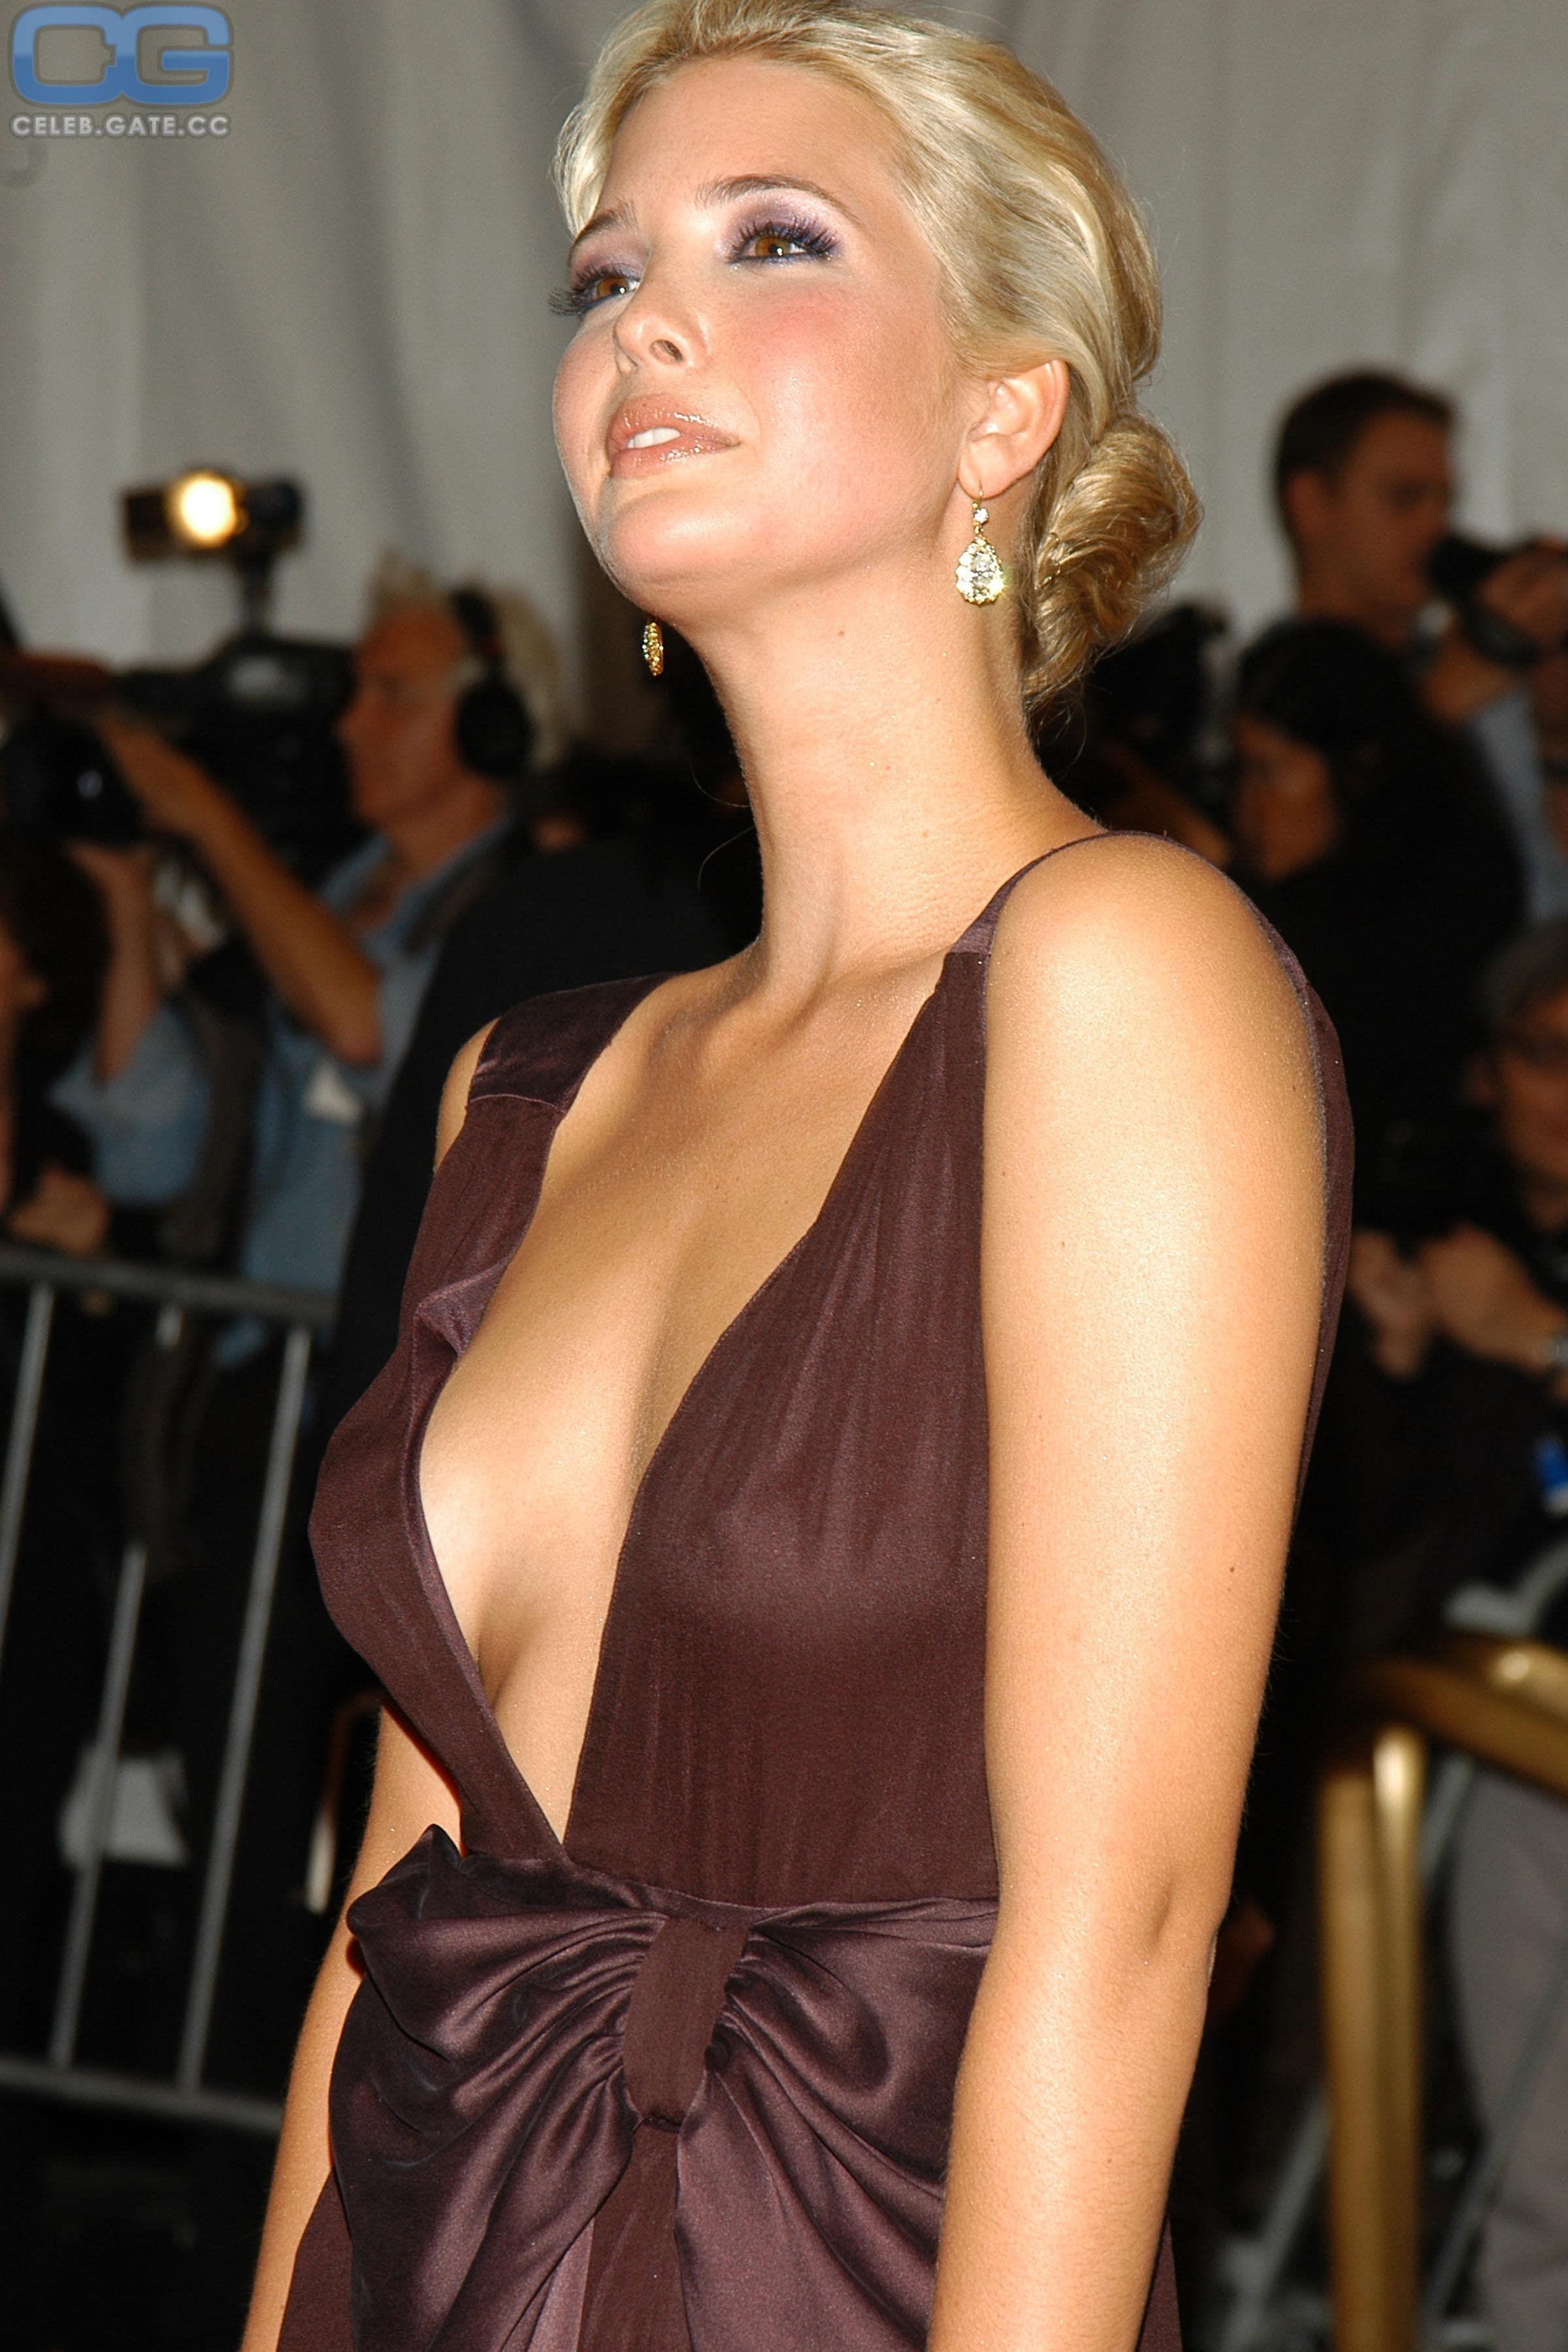 20 Super Hot Ivanka Trump Bikini S Pics That Will Drive You Mad Ivanka Trump Photos Ivanka Trump Bikini Ivanka Trump Style